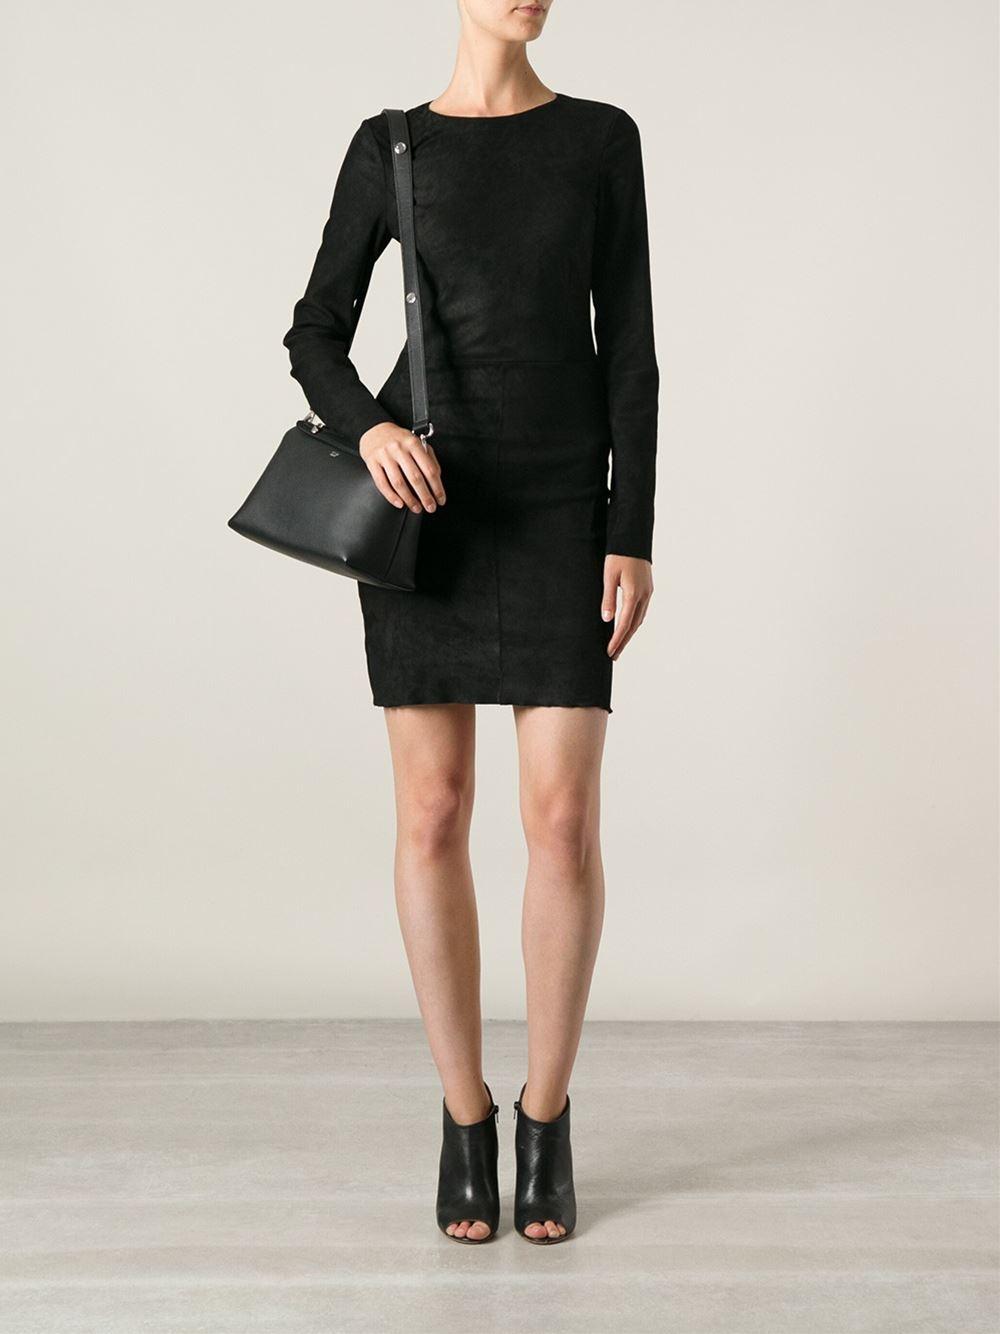 ... promo code lyst fendi by the way shoulder bag in black 6cefd 44d64 86d3b7c59403a